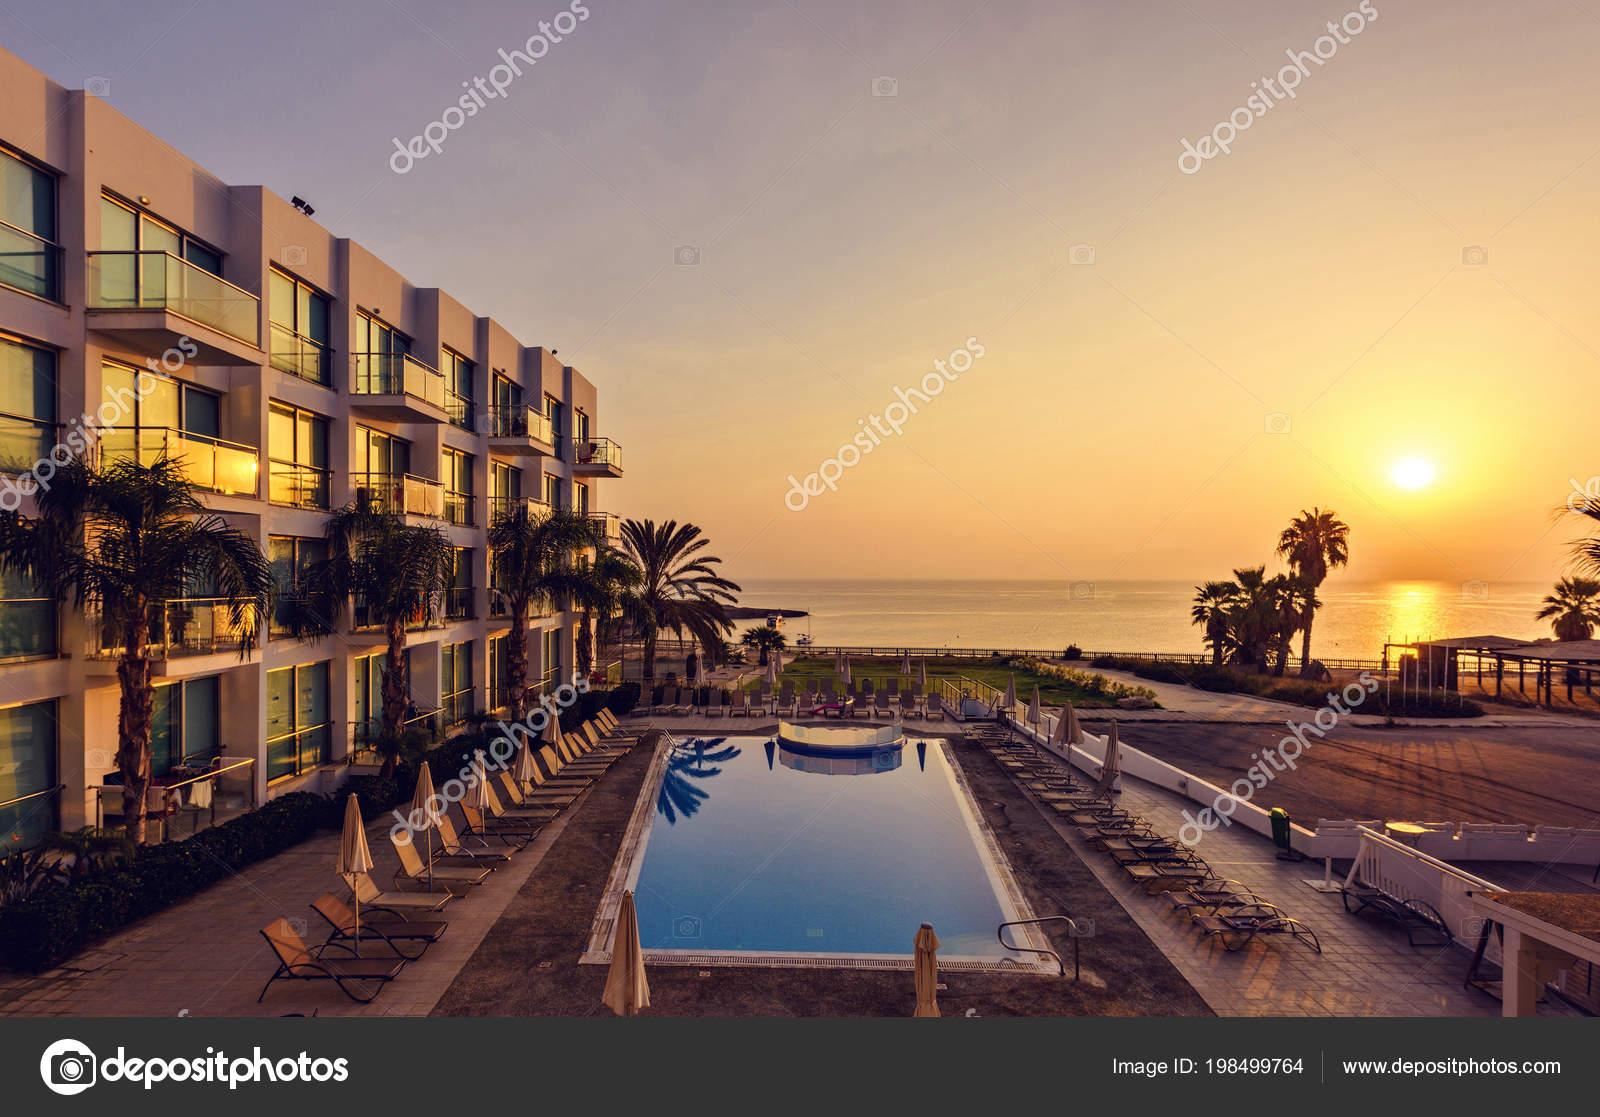 0127b9eccf50 depositphotos_198499764-stock-photo-protaras-cyprus-september-2017-view.jpg